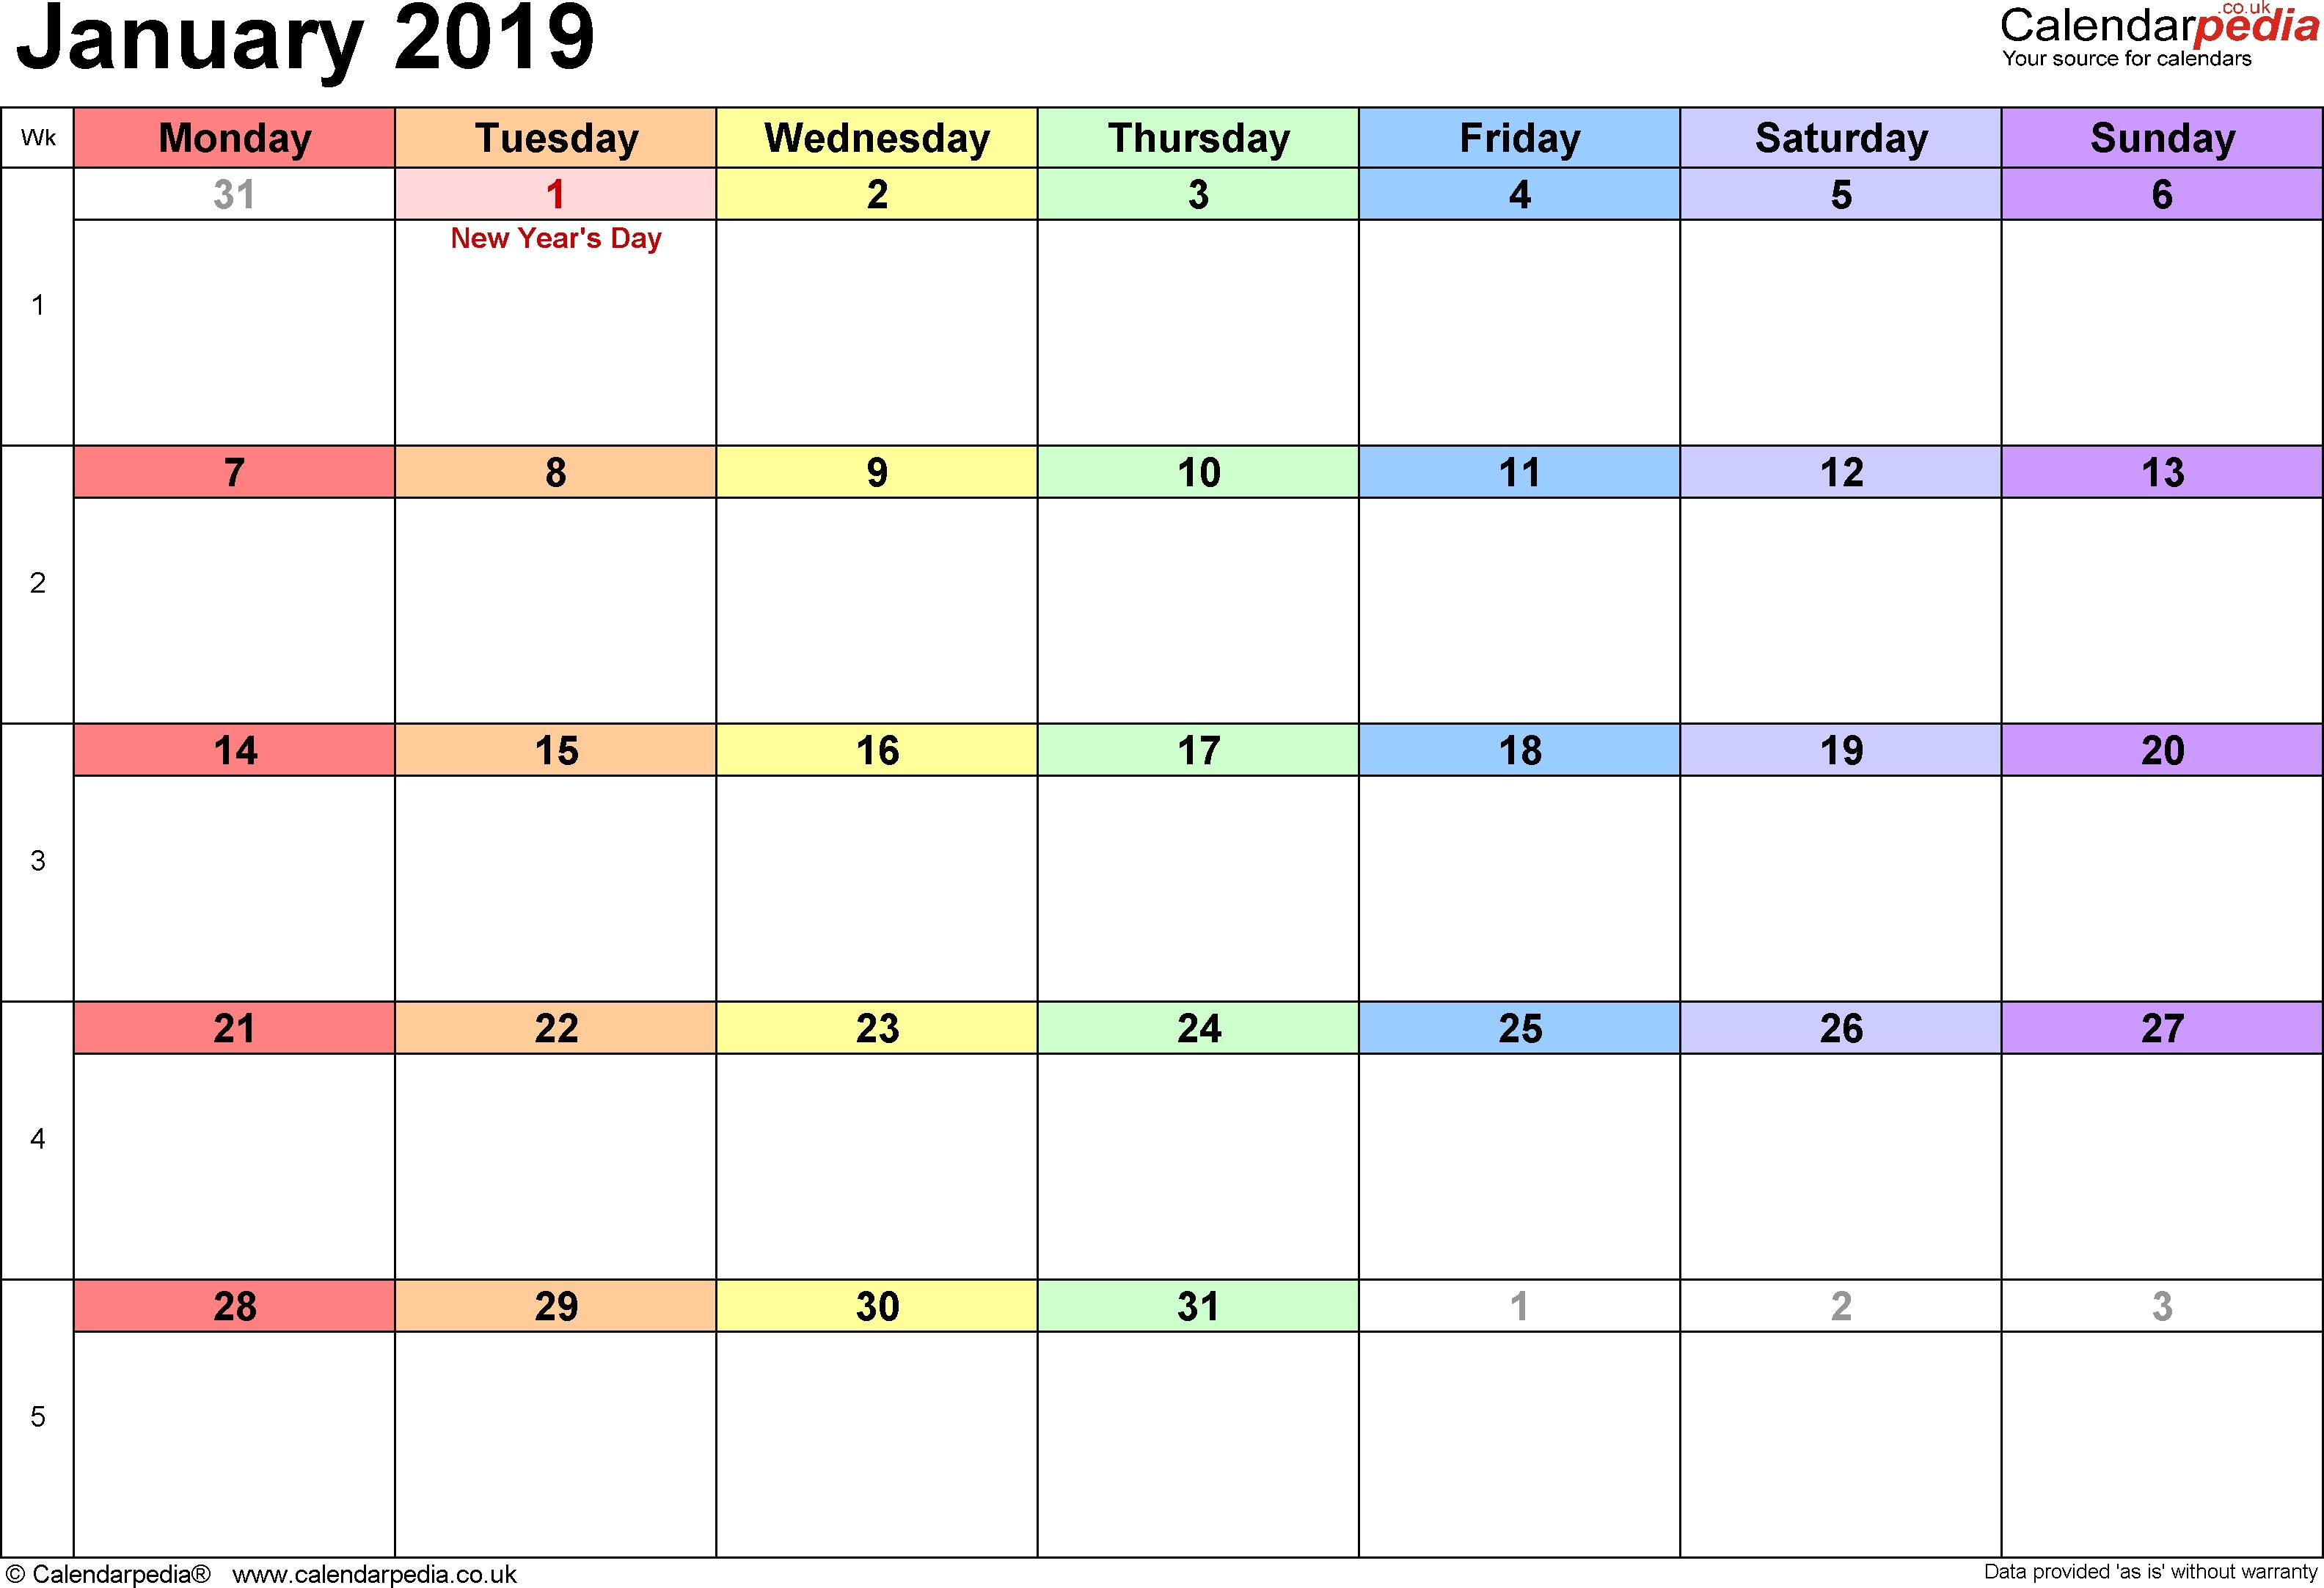 January Calendar 2019 Uk